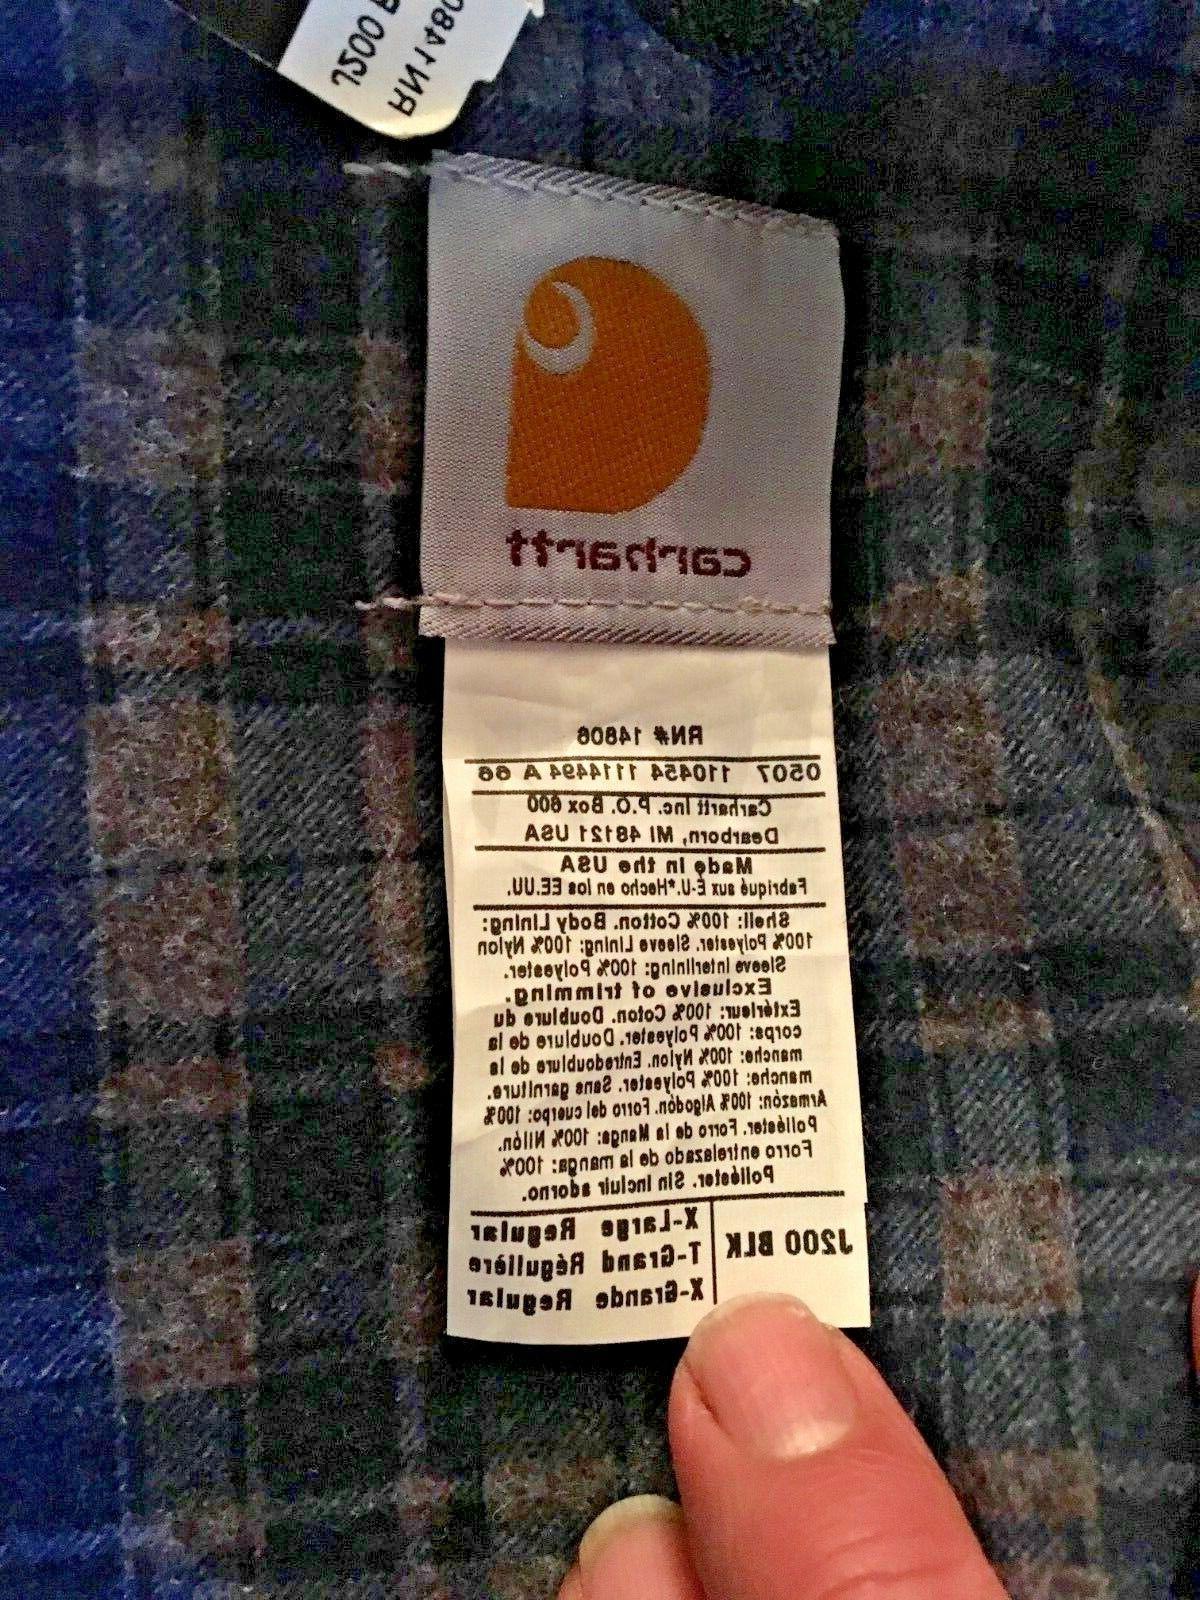 CARHARTT RN14806 Lined Tags Vintage